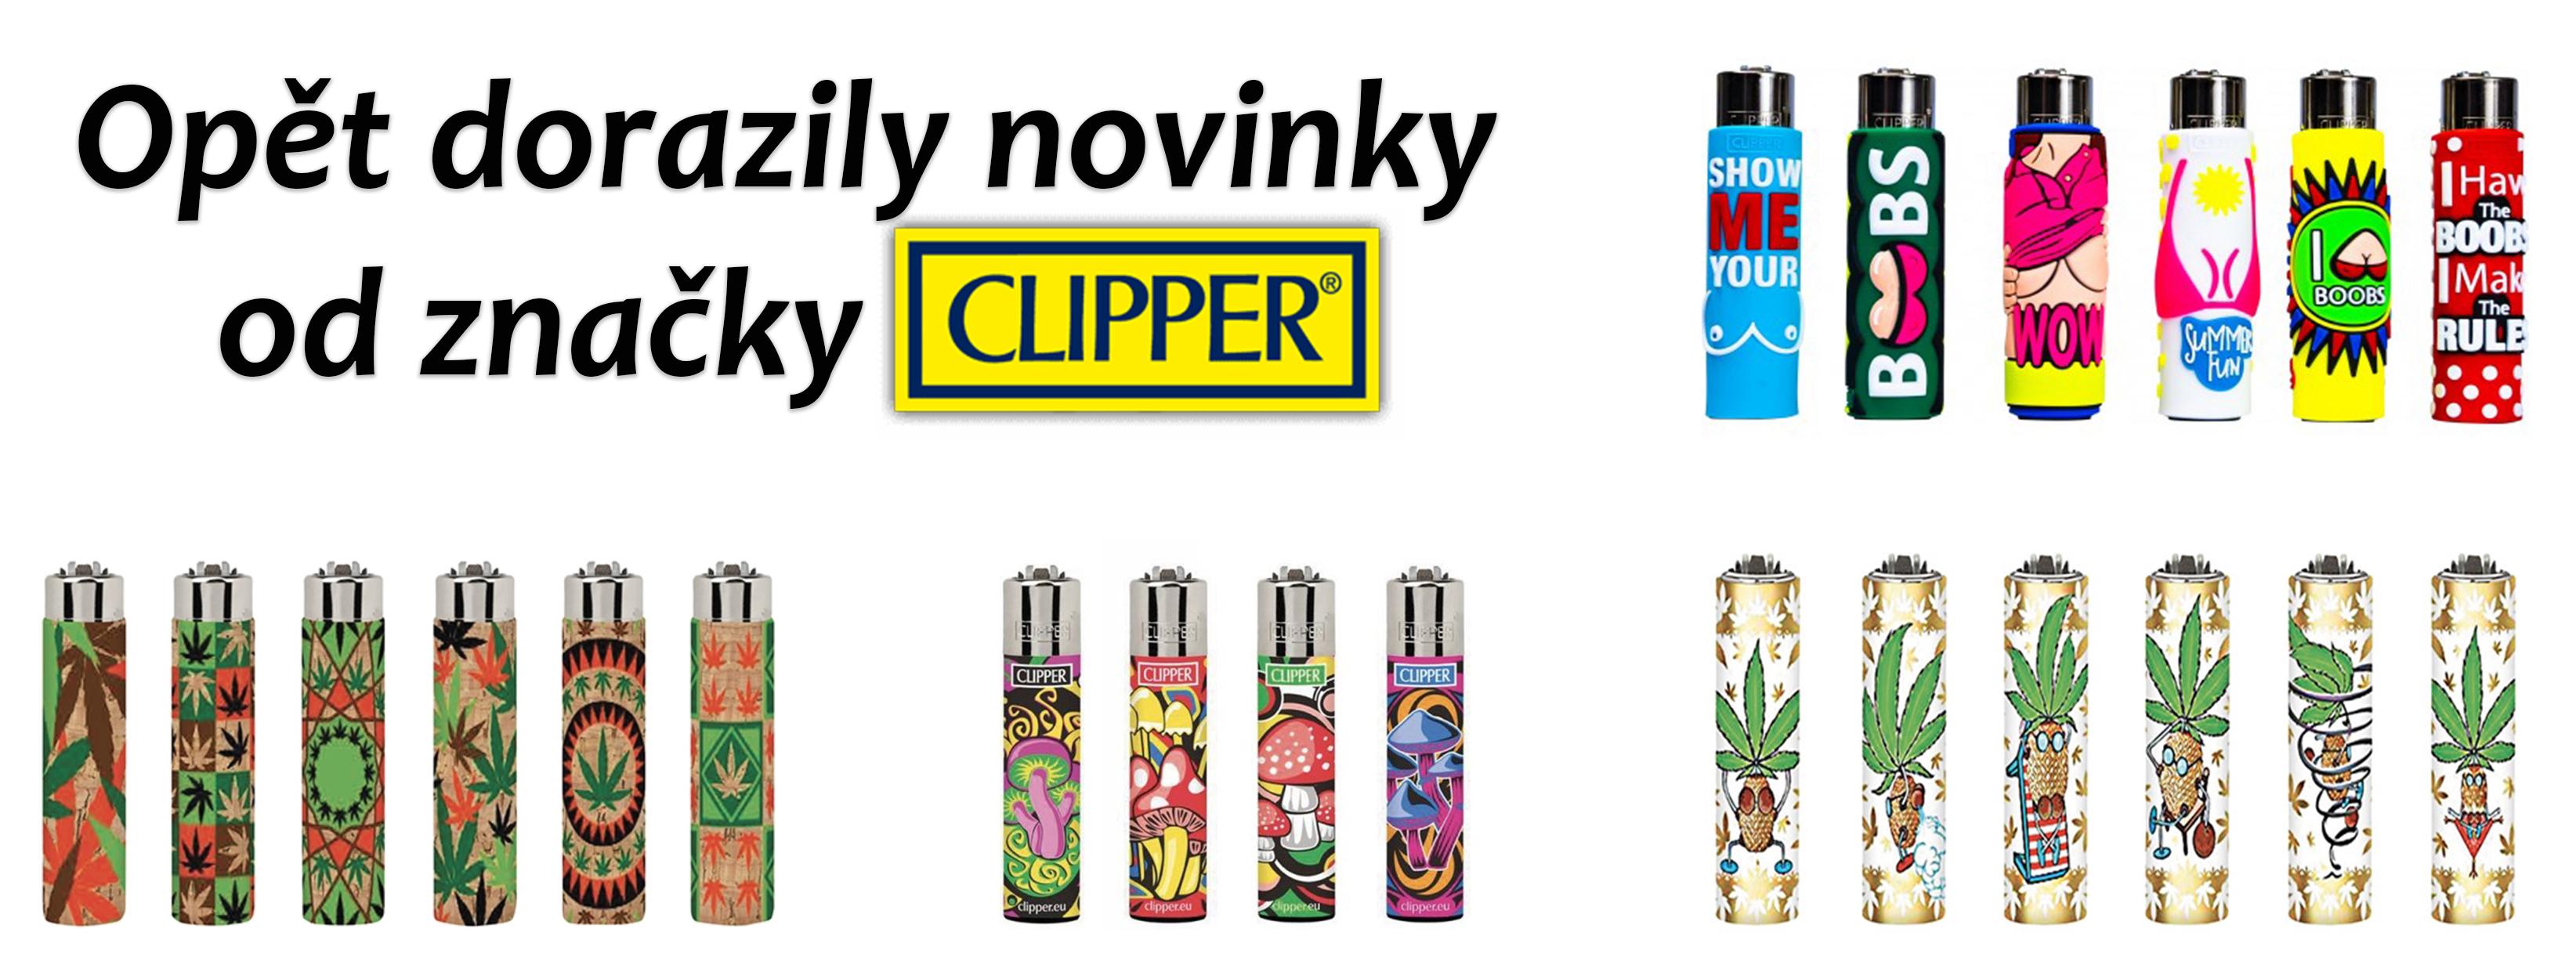 Nové Clippery